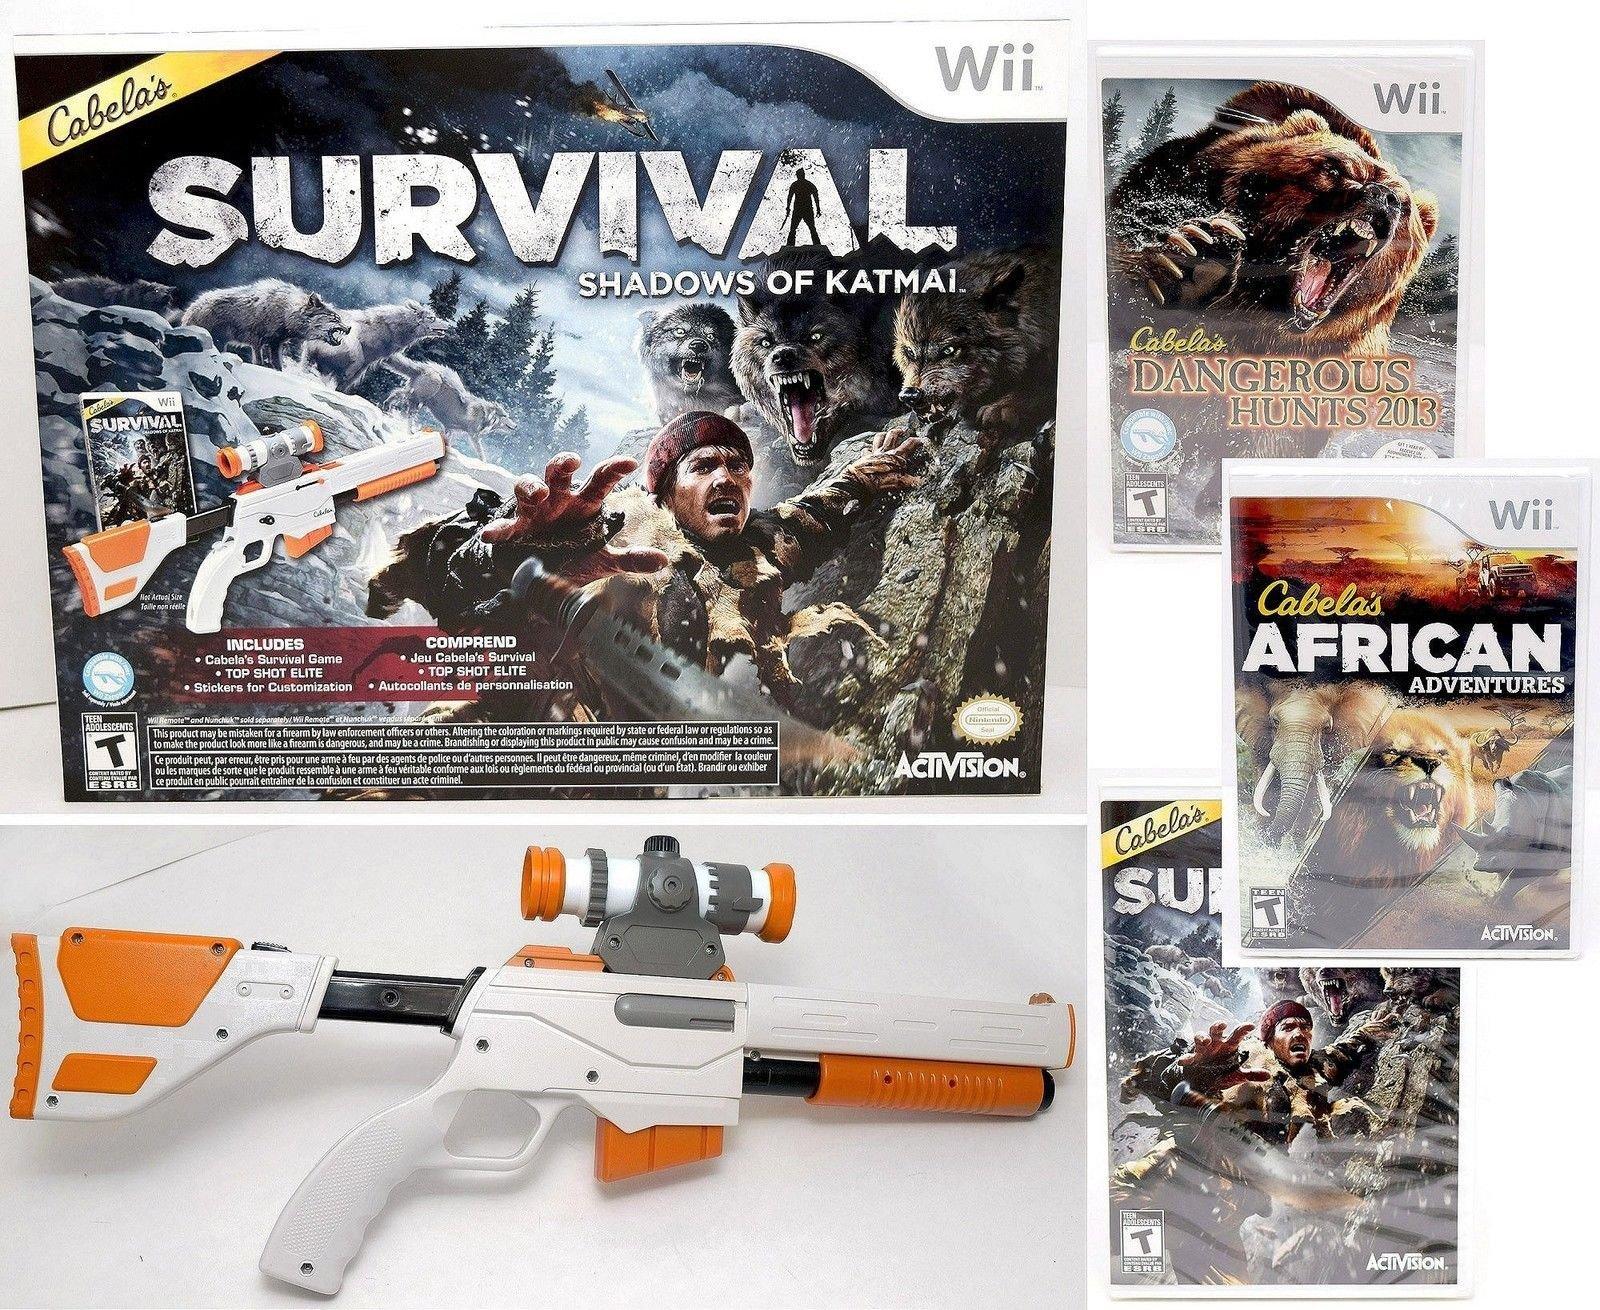 Wii Cabela's 3-GAME GUN BUNDLE Shadows Katmai African Adventures Hunts 2013